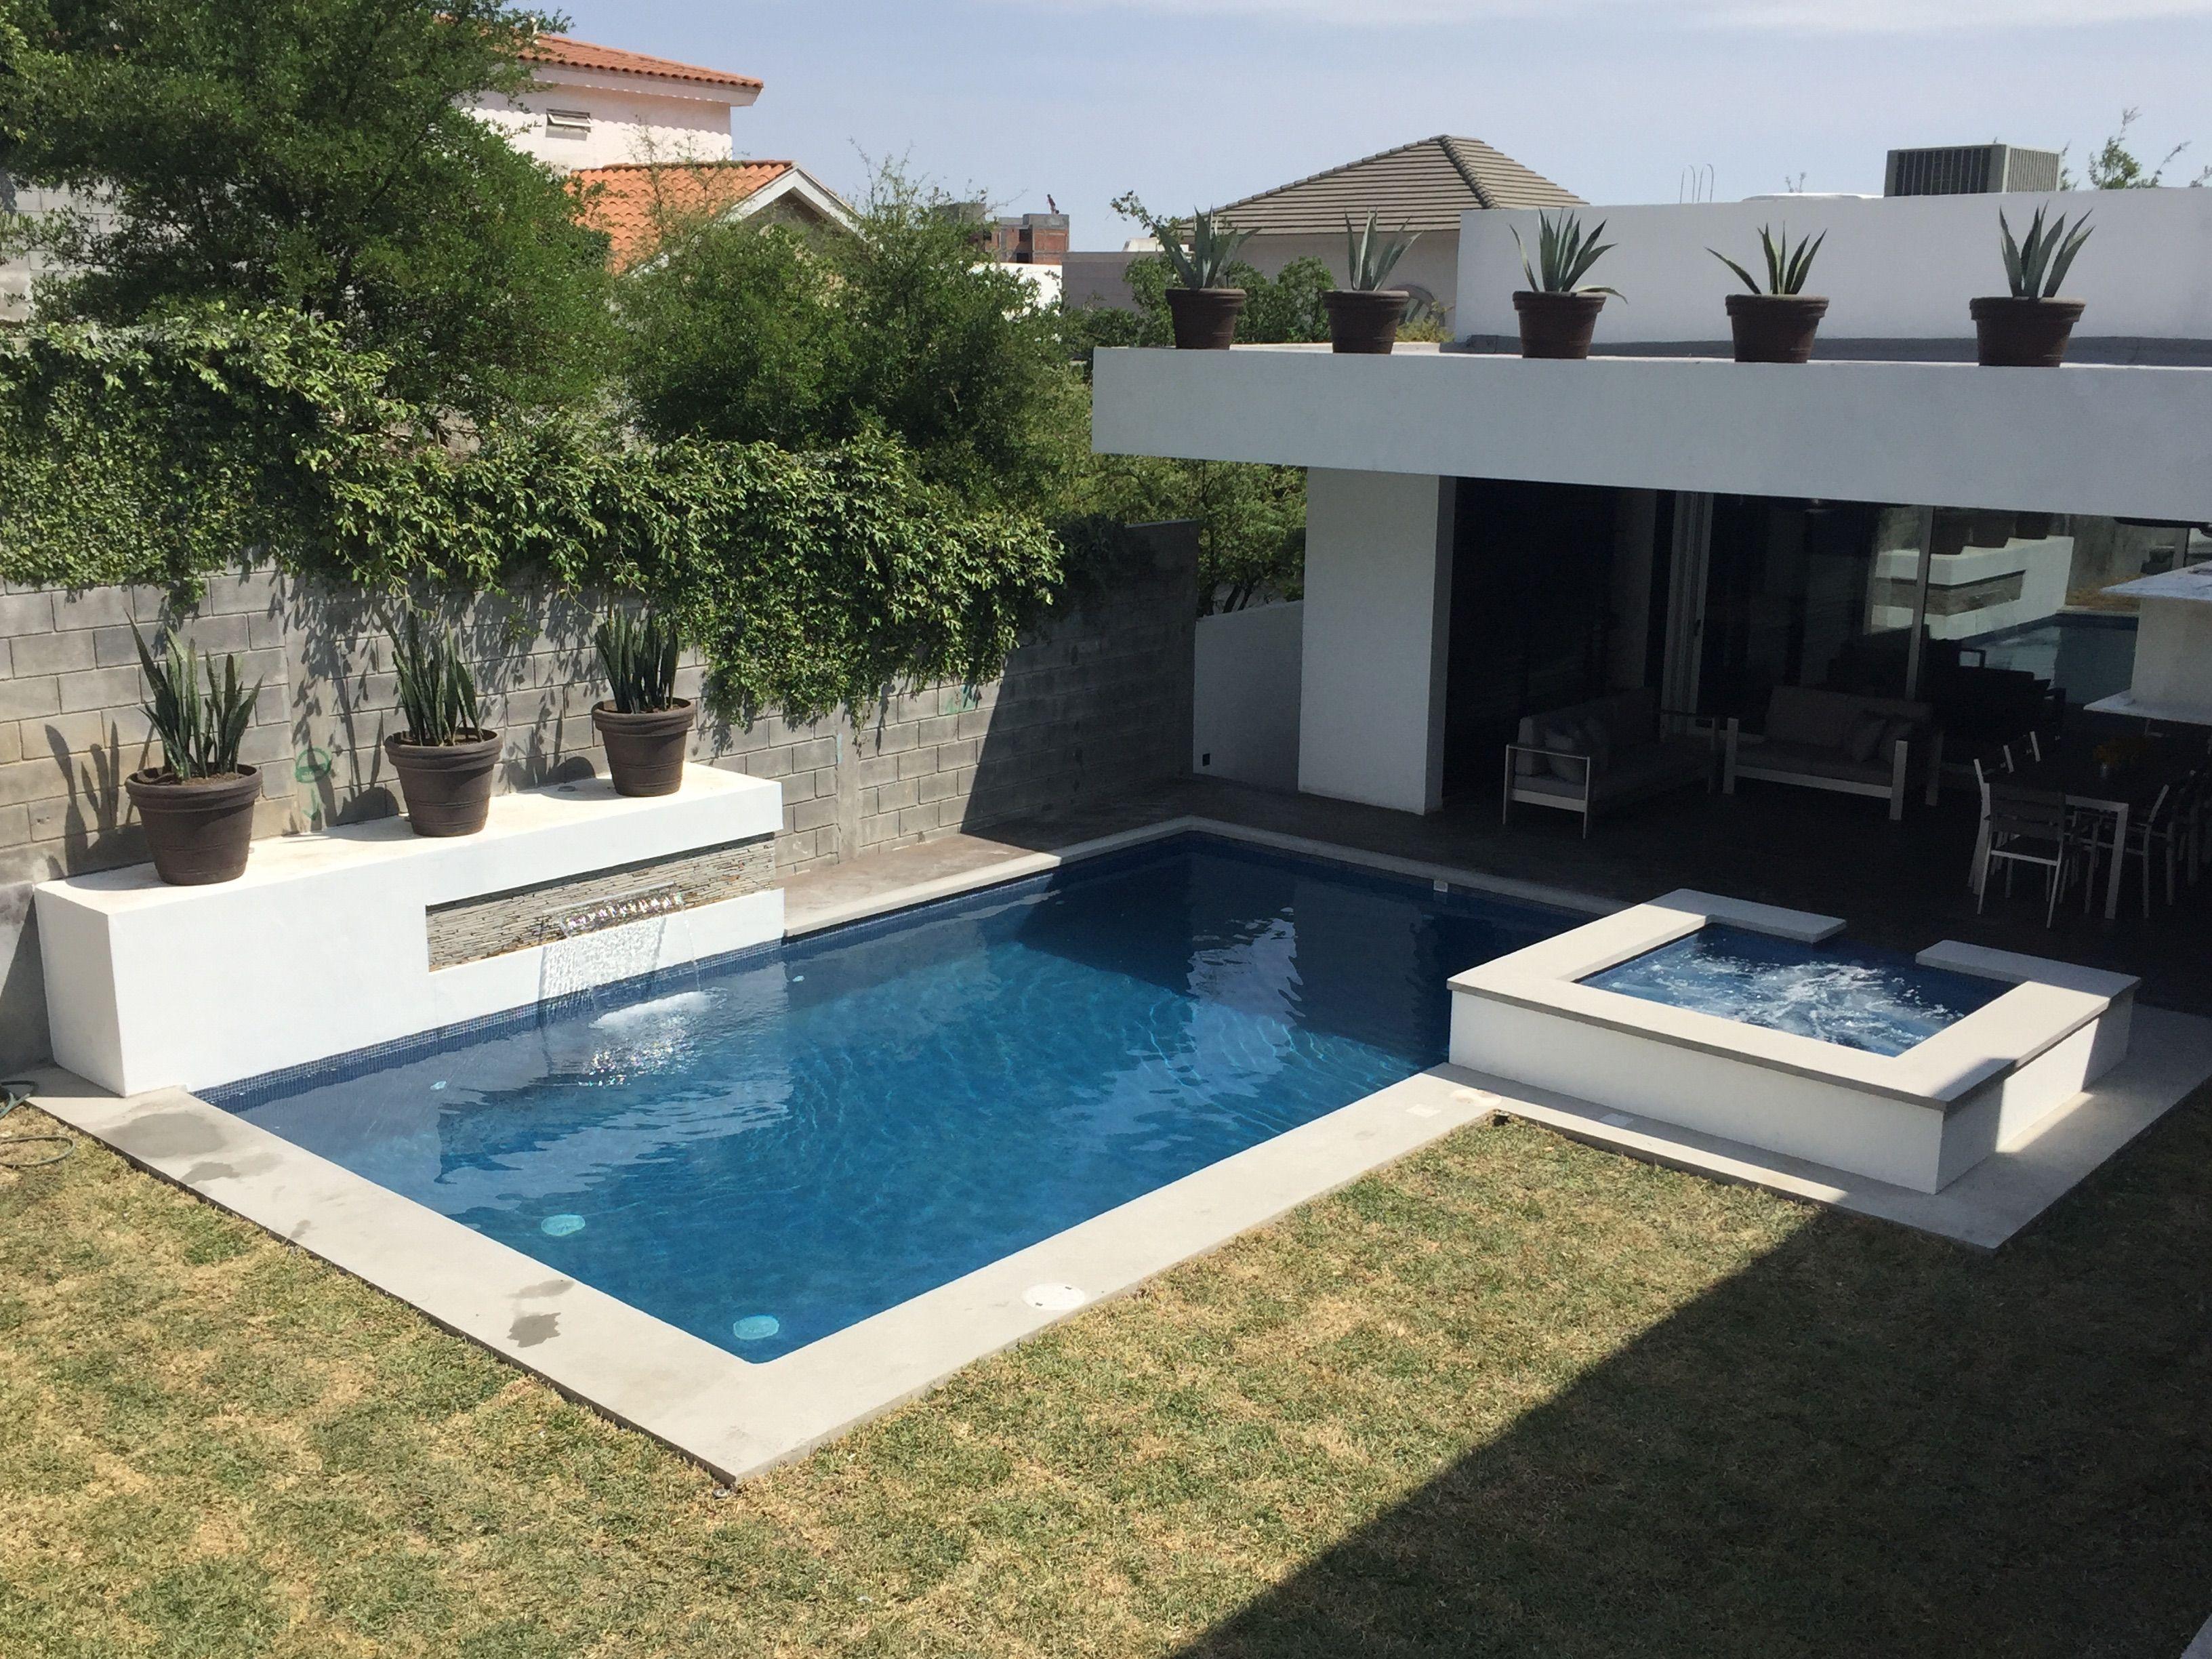 351 arquitectos piscina residencial de x con for Jacuzzi 8 personas